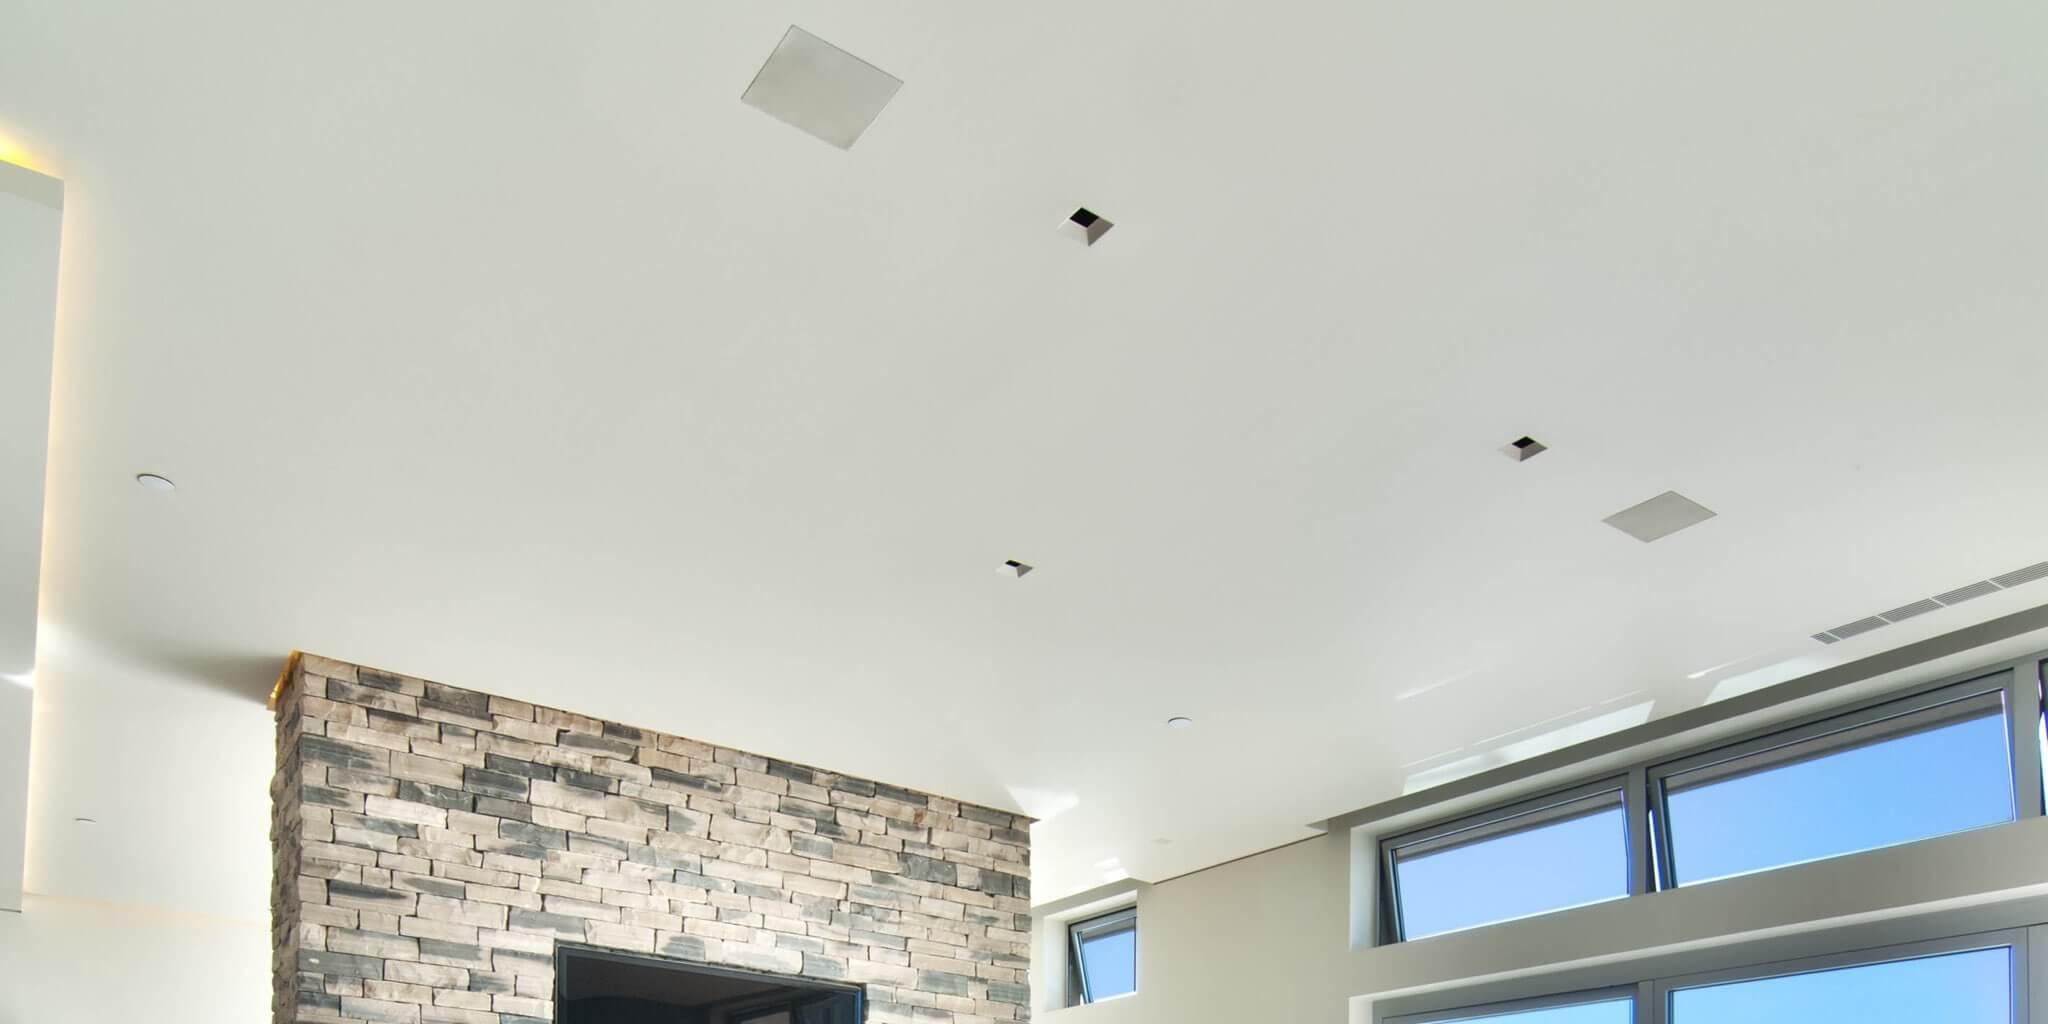 Sonance Architectural 990 LivingroomAnglehdr_JPEG_2048x1024_60%